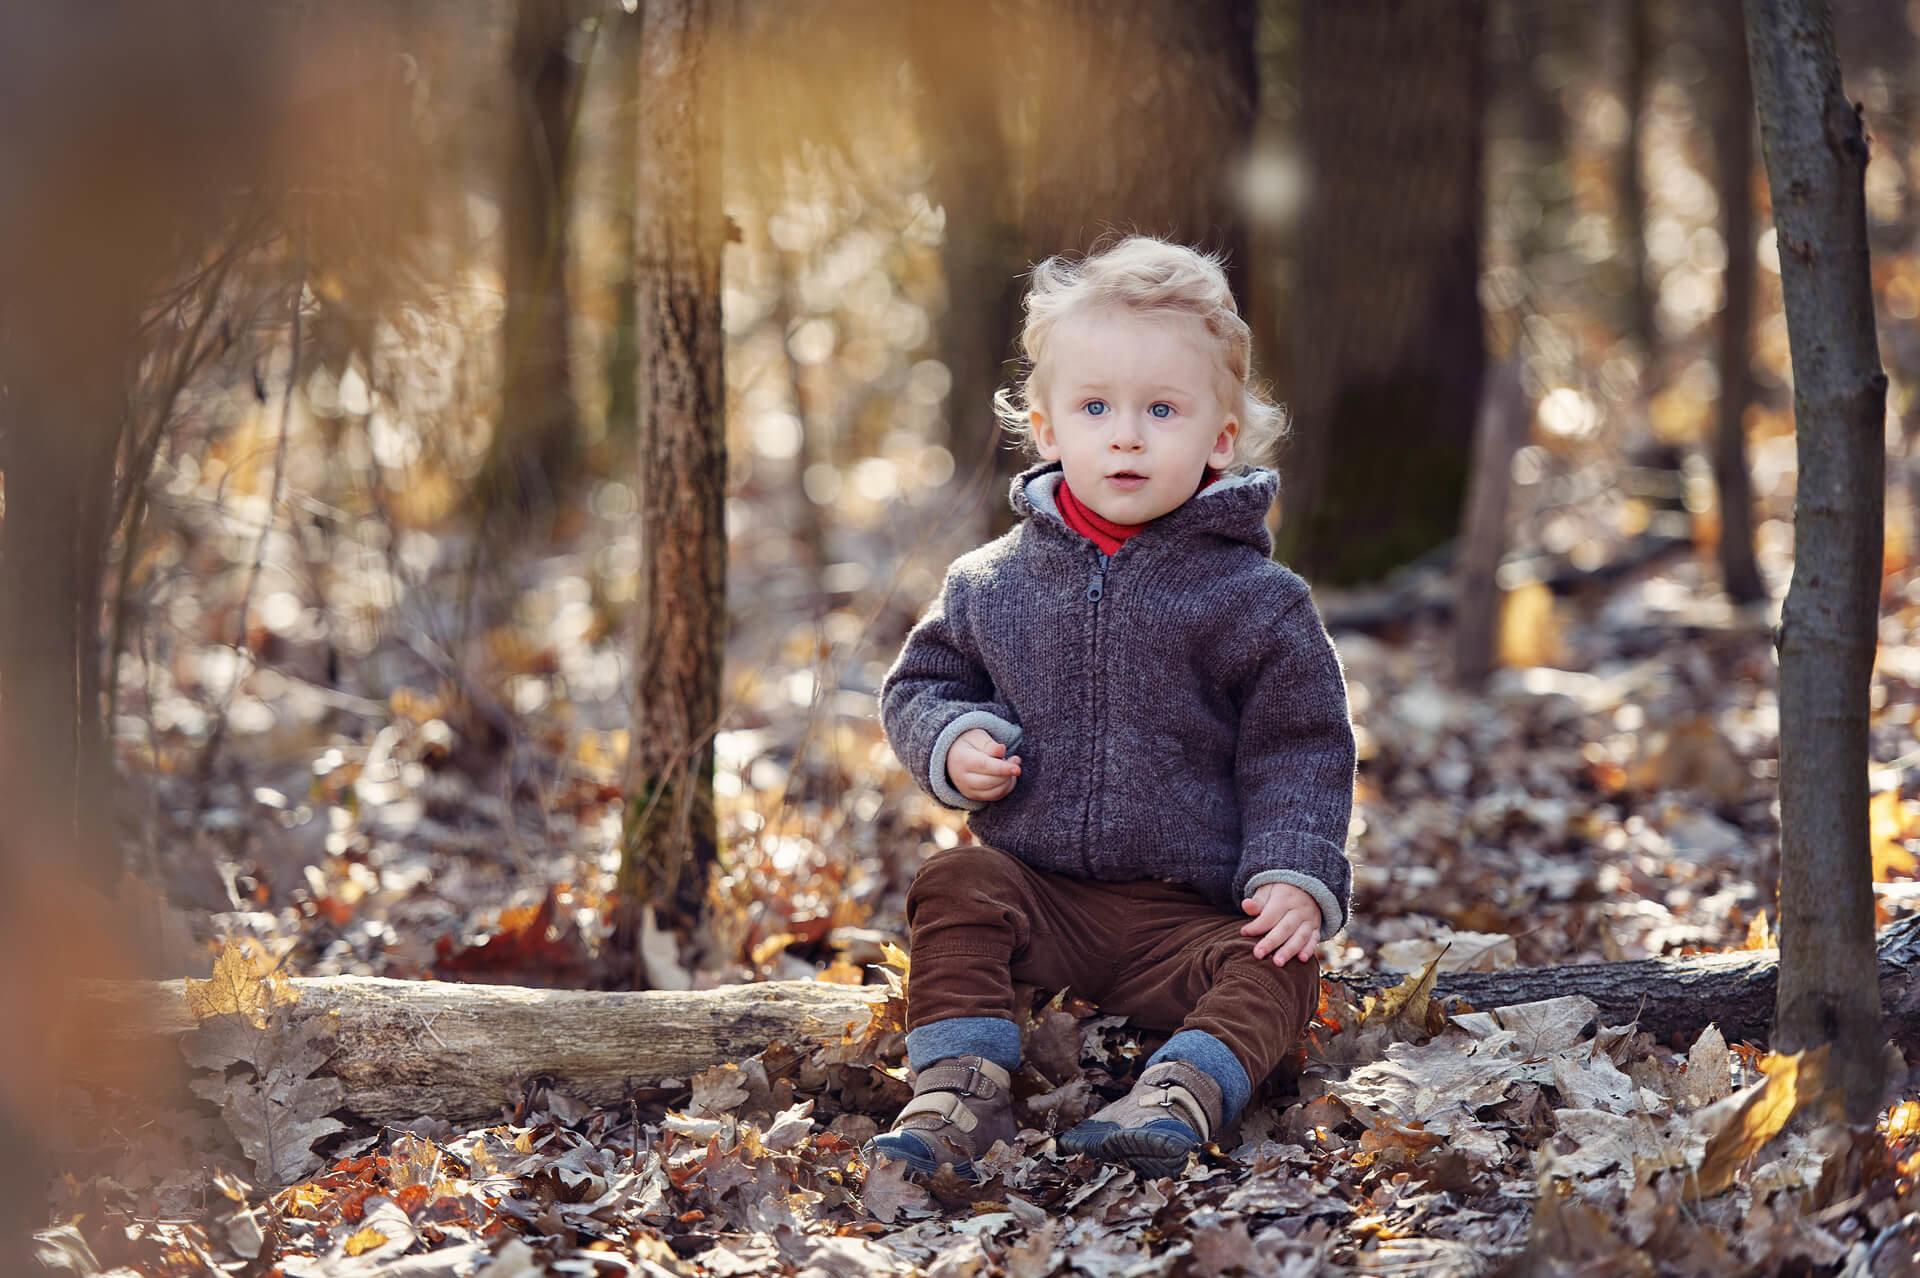 profesionalny fotograf Peter Norulak Kosice umelecke fotky deti exterier priroda jesen_04